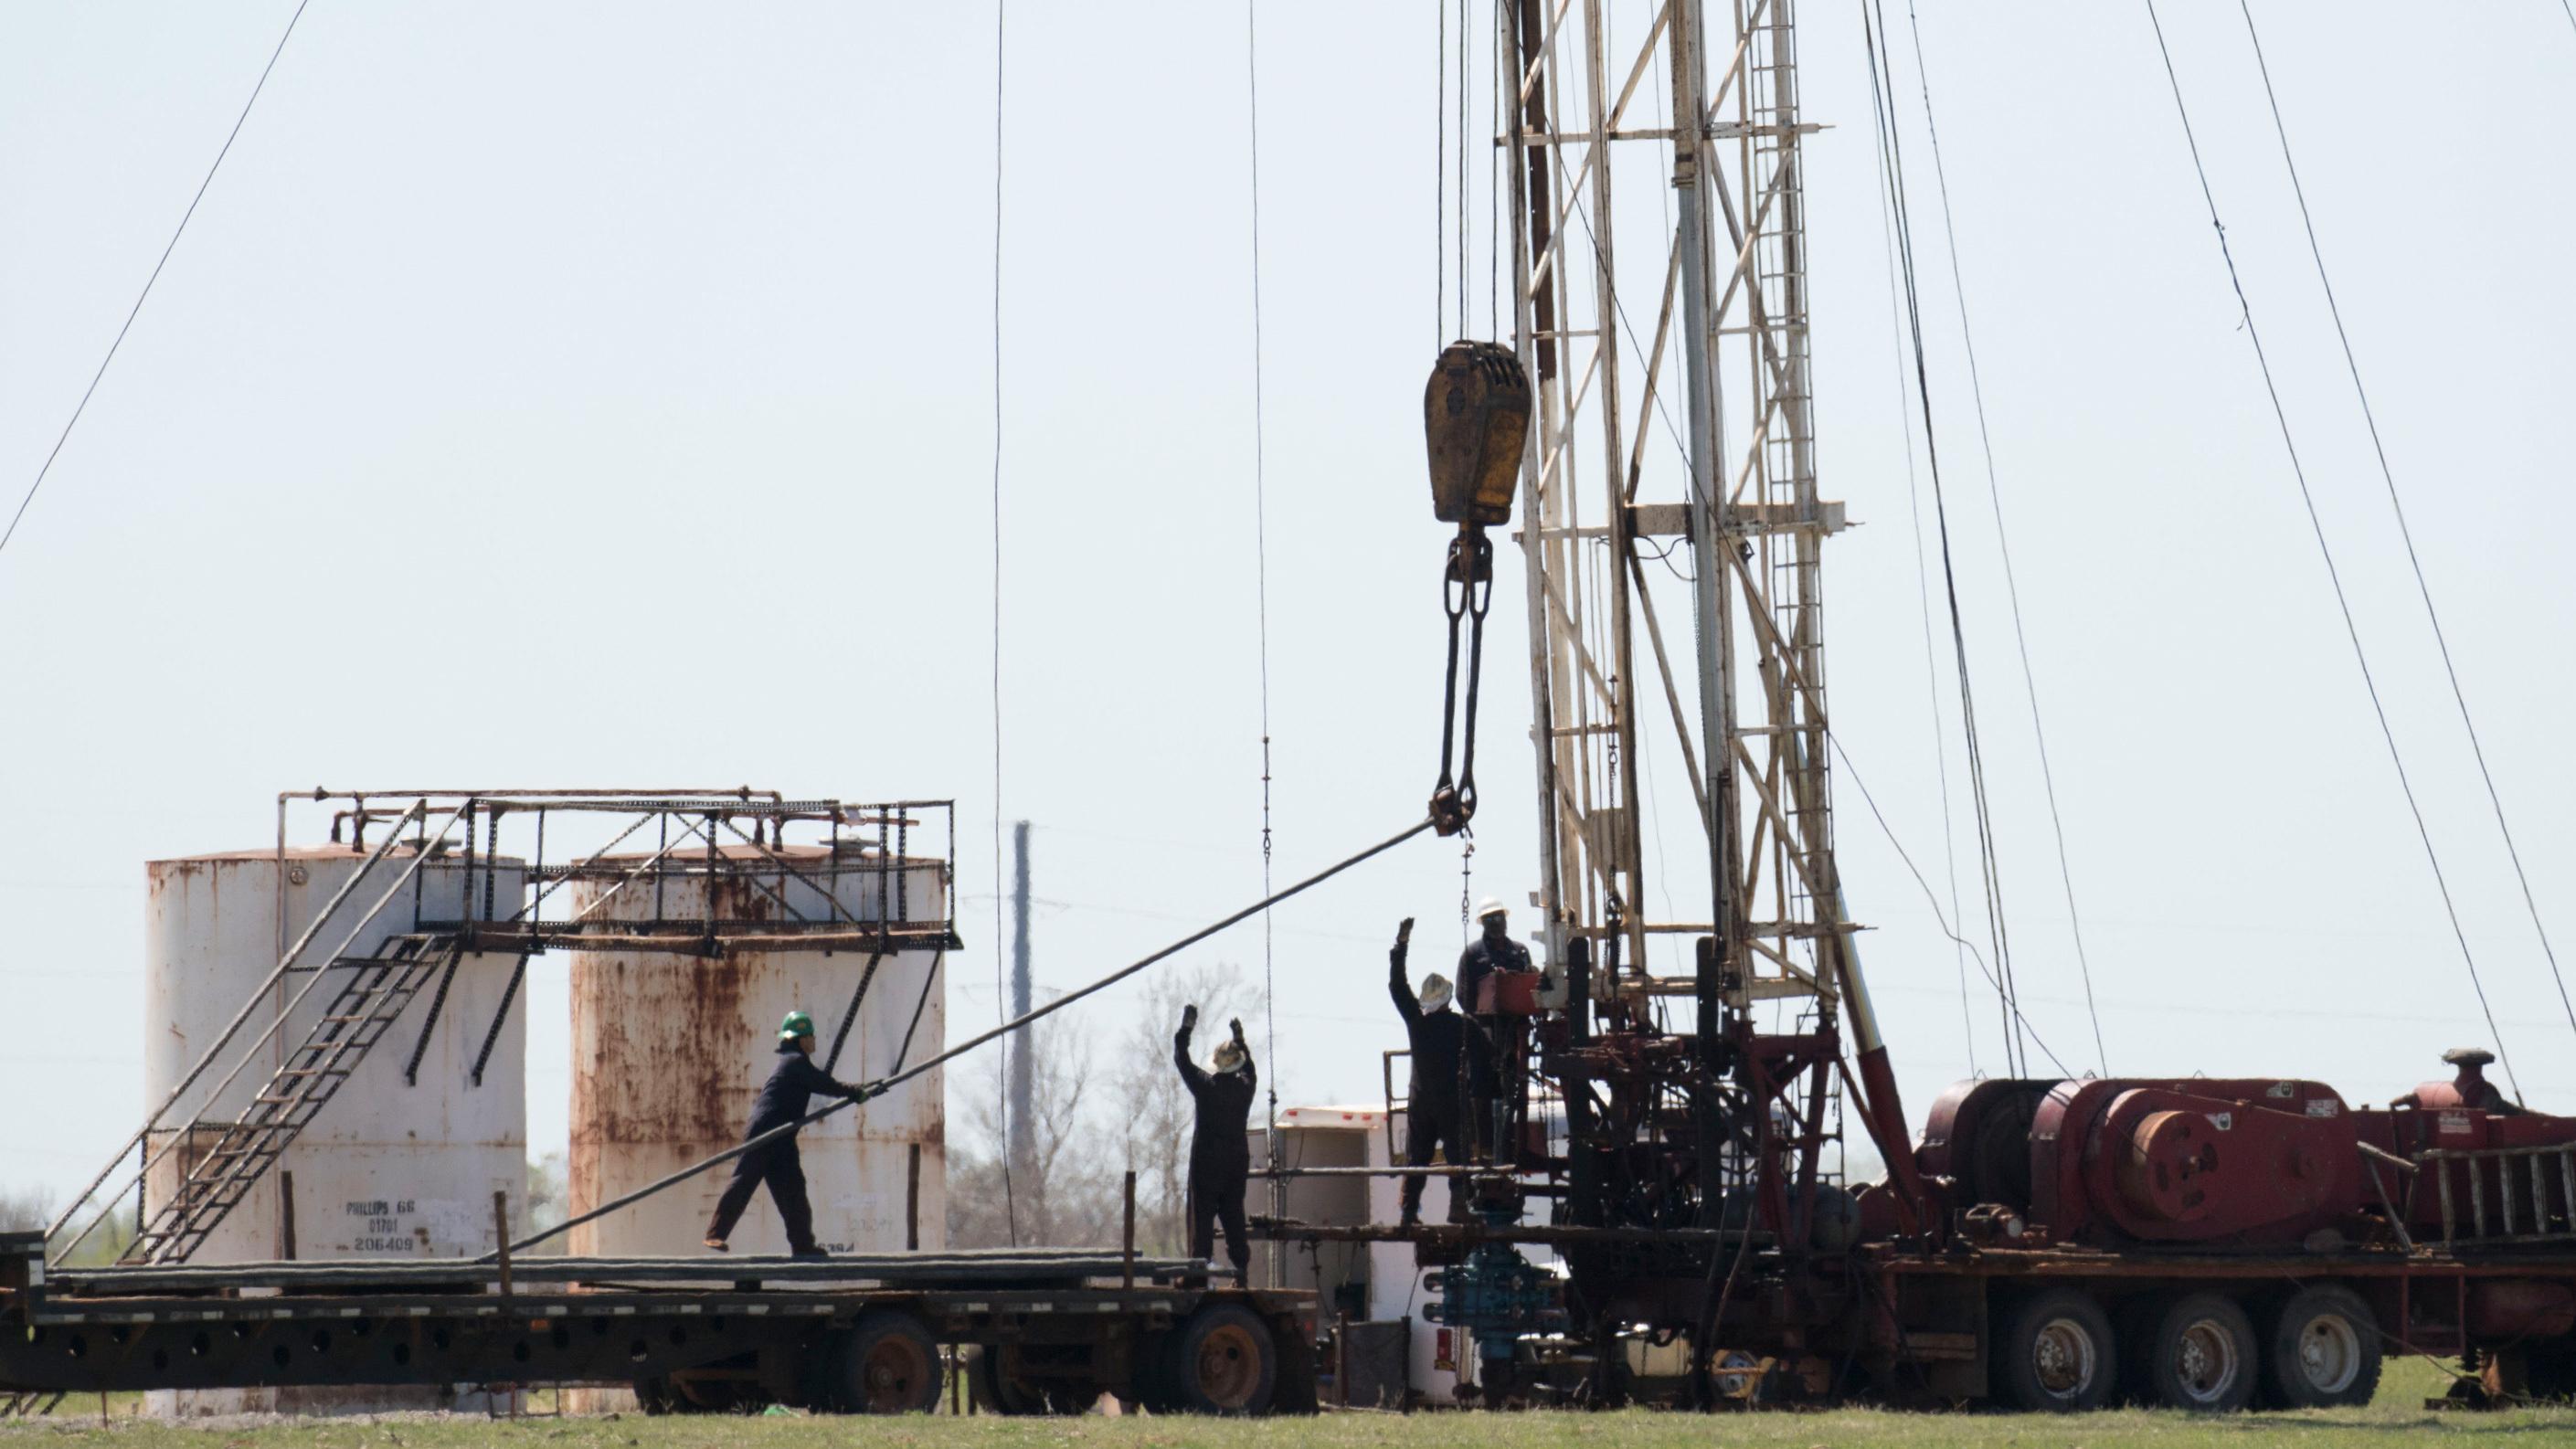 Image for Big Oil Has A Diversity Problem Article